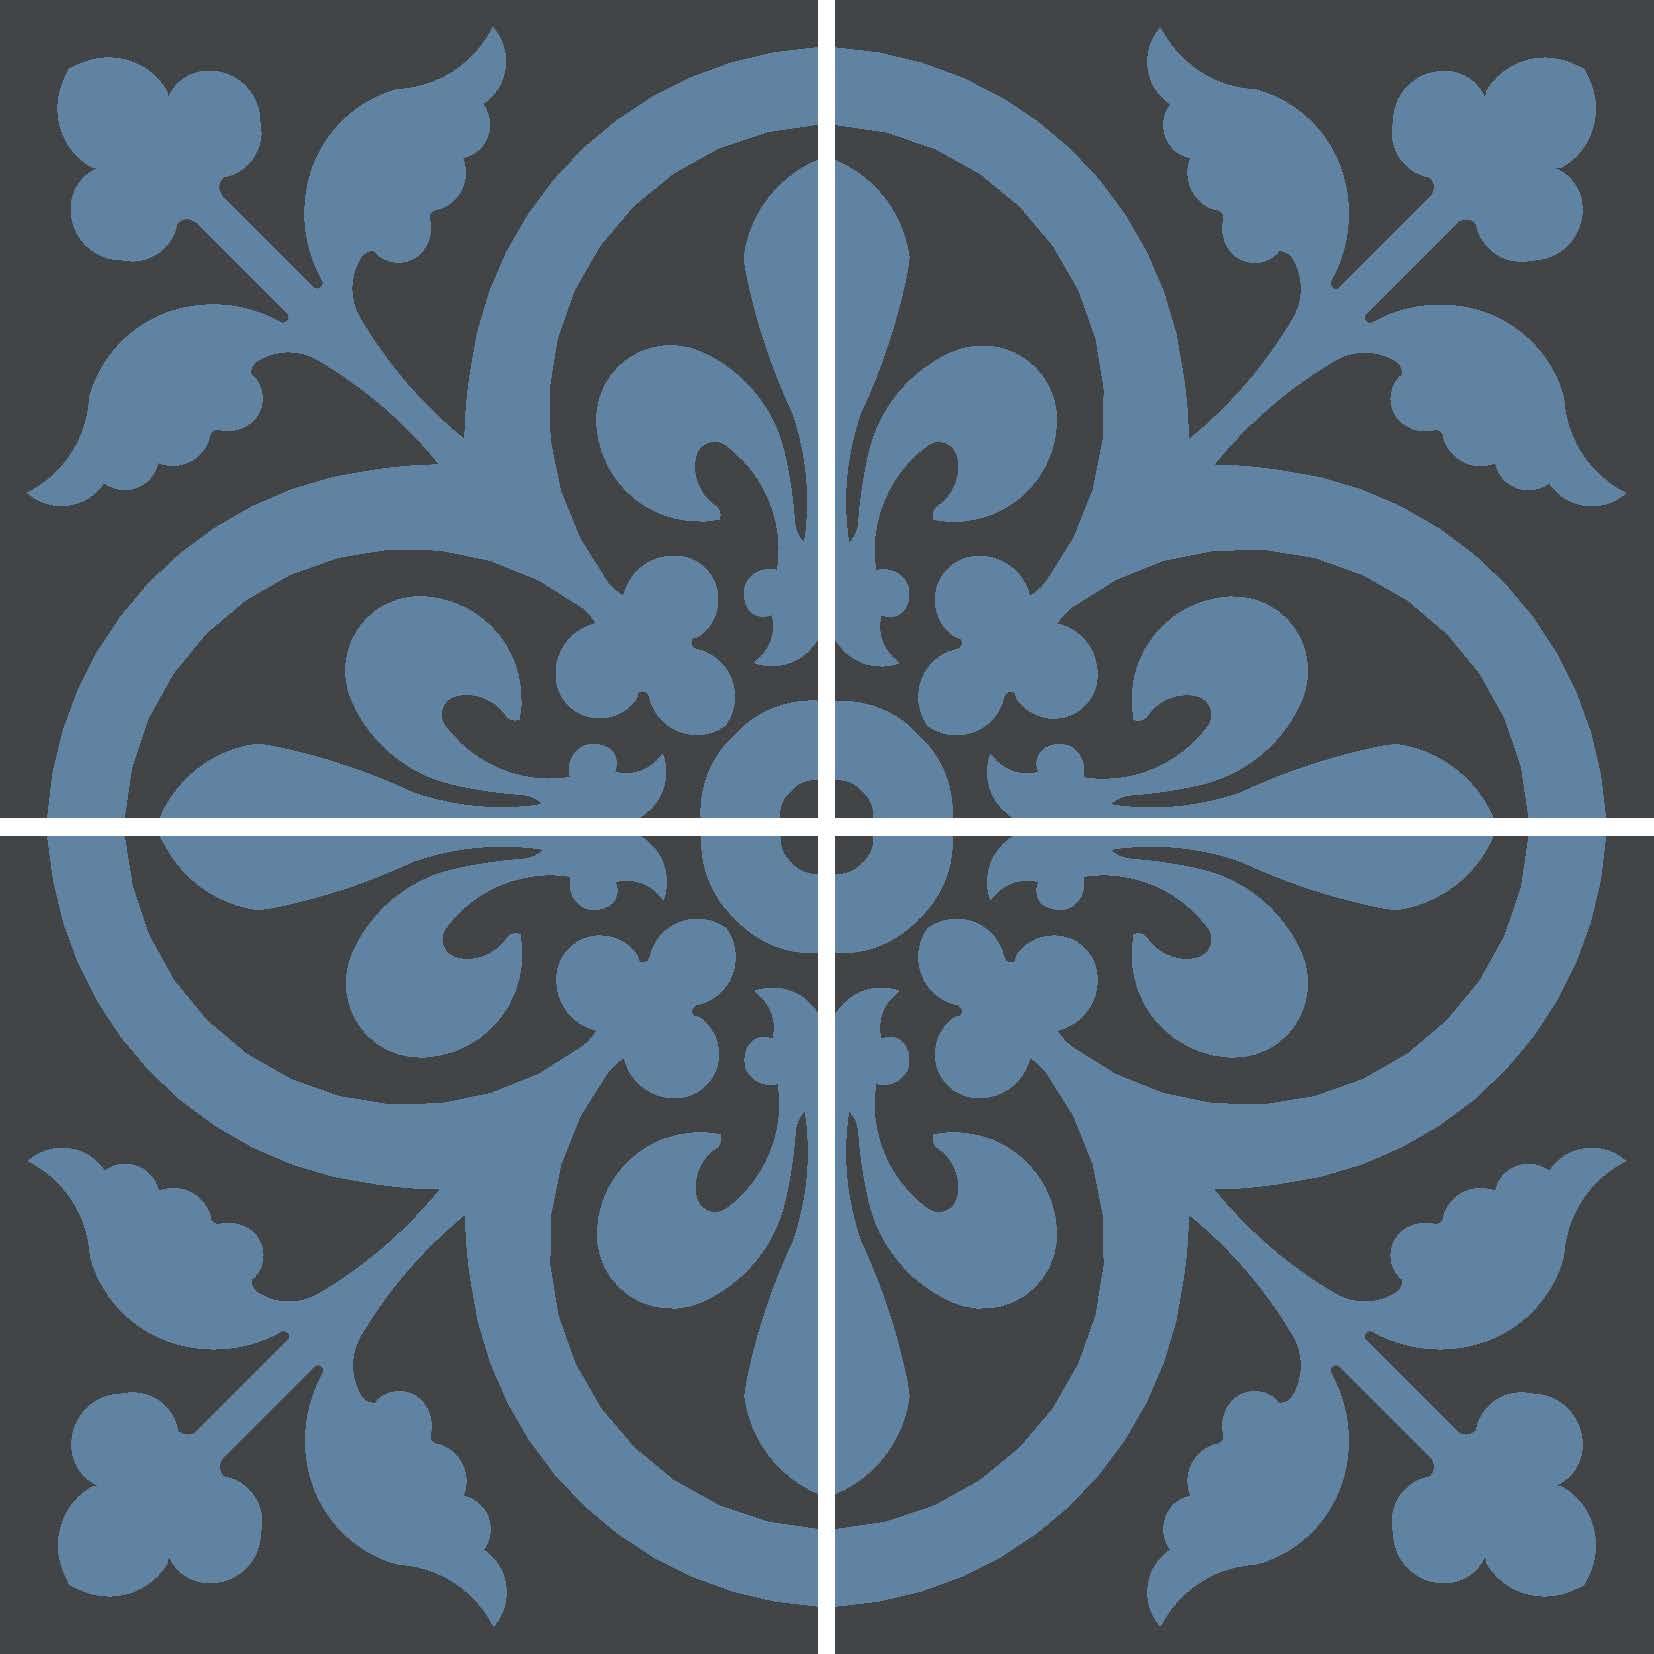 Anvers1-noir bleu foncÇ.jpg